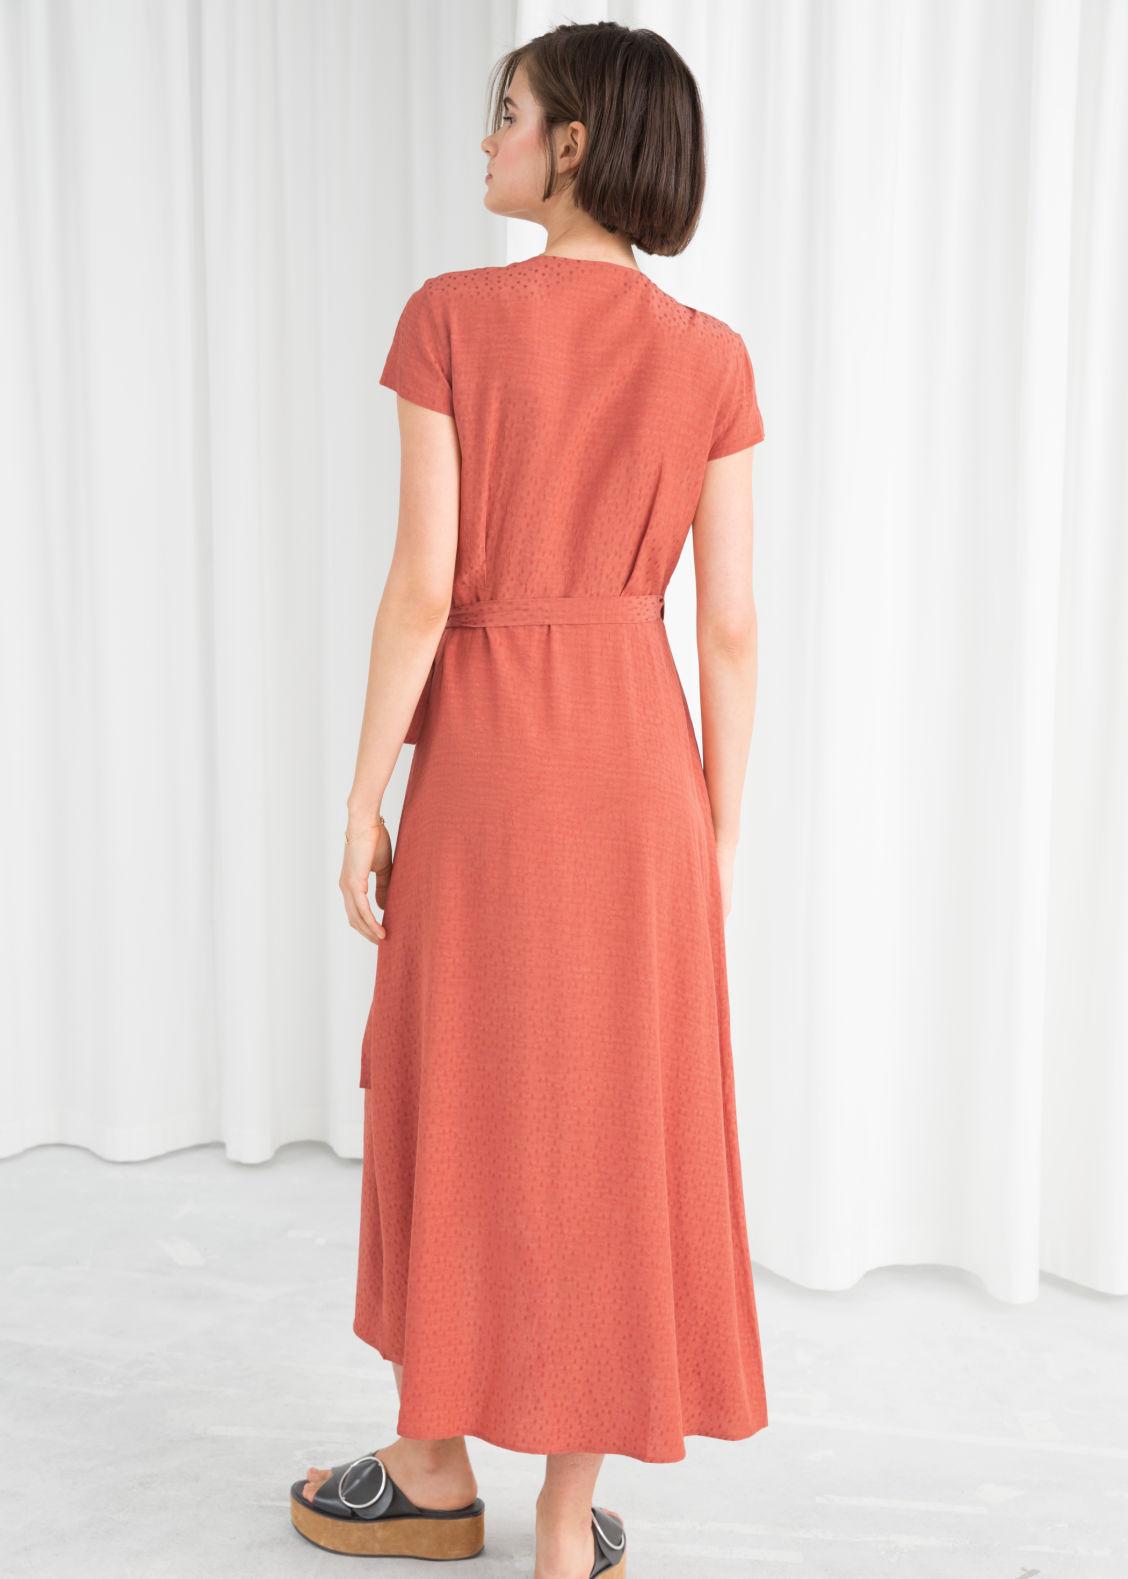 4893e4711a2 Curved Hem Midi Wrap Dress - Salmon - Wrap dresses -   Other Stories